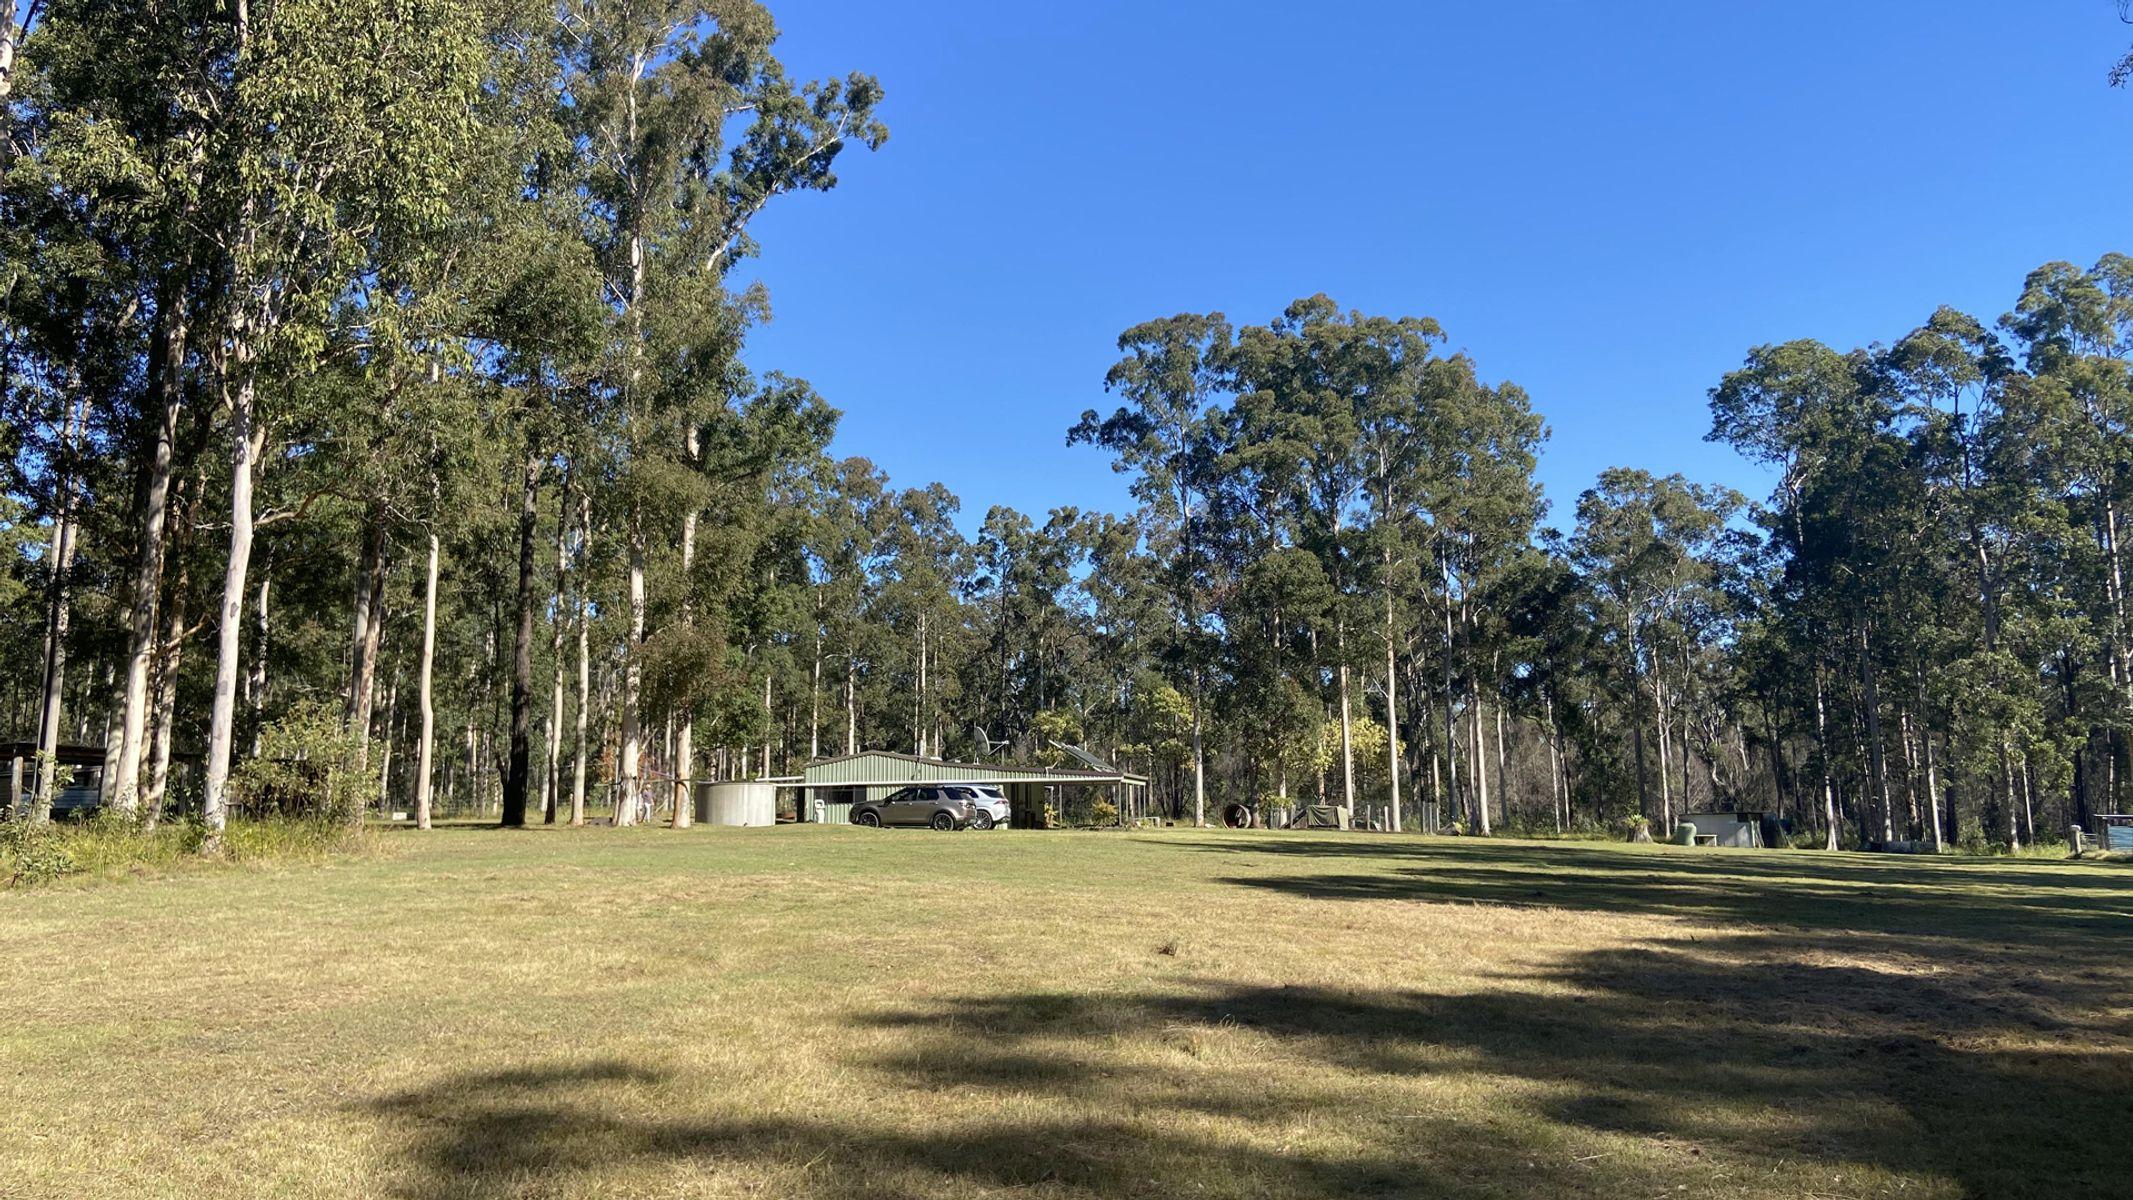 650 Tullymorgan-Jackybulbin Road, Jacky Bulbin Flat, NSW 2463